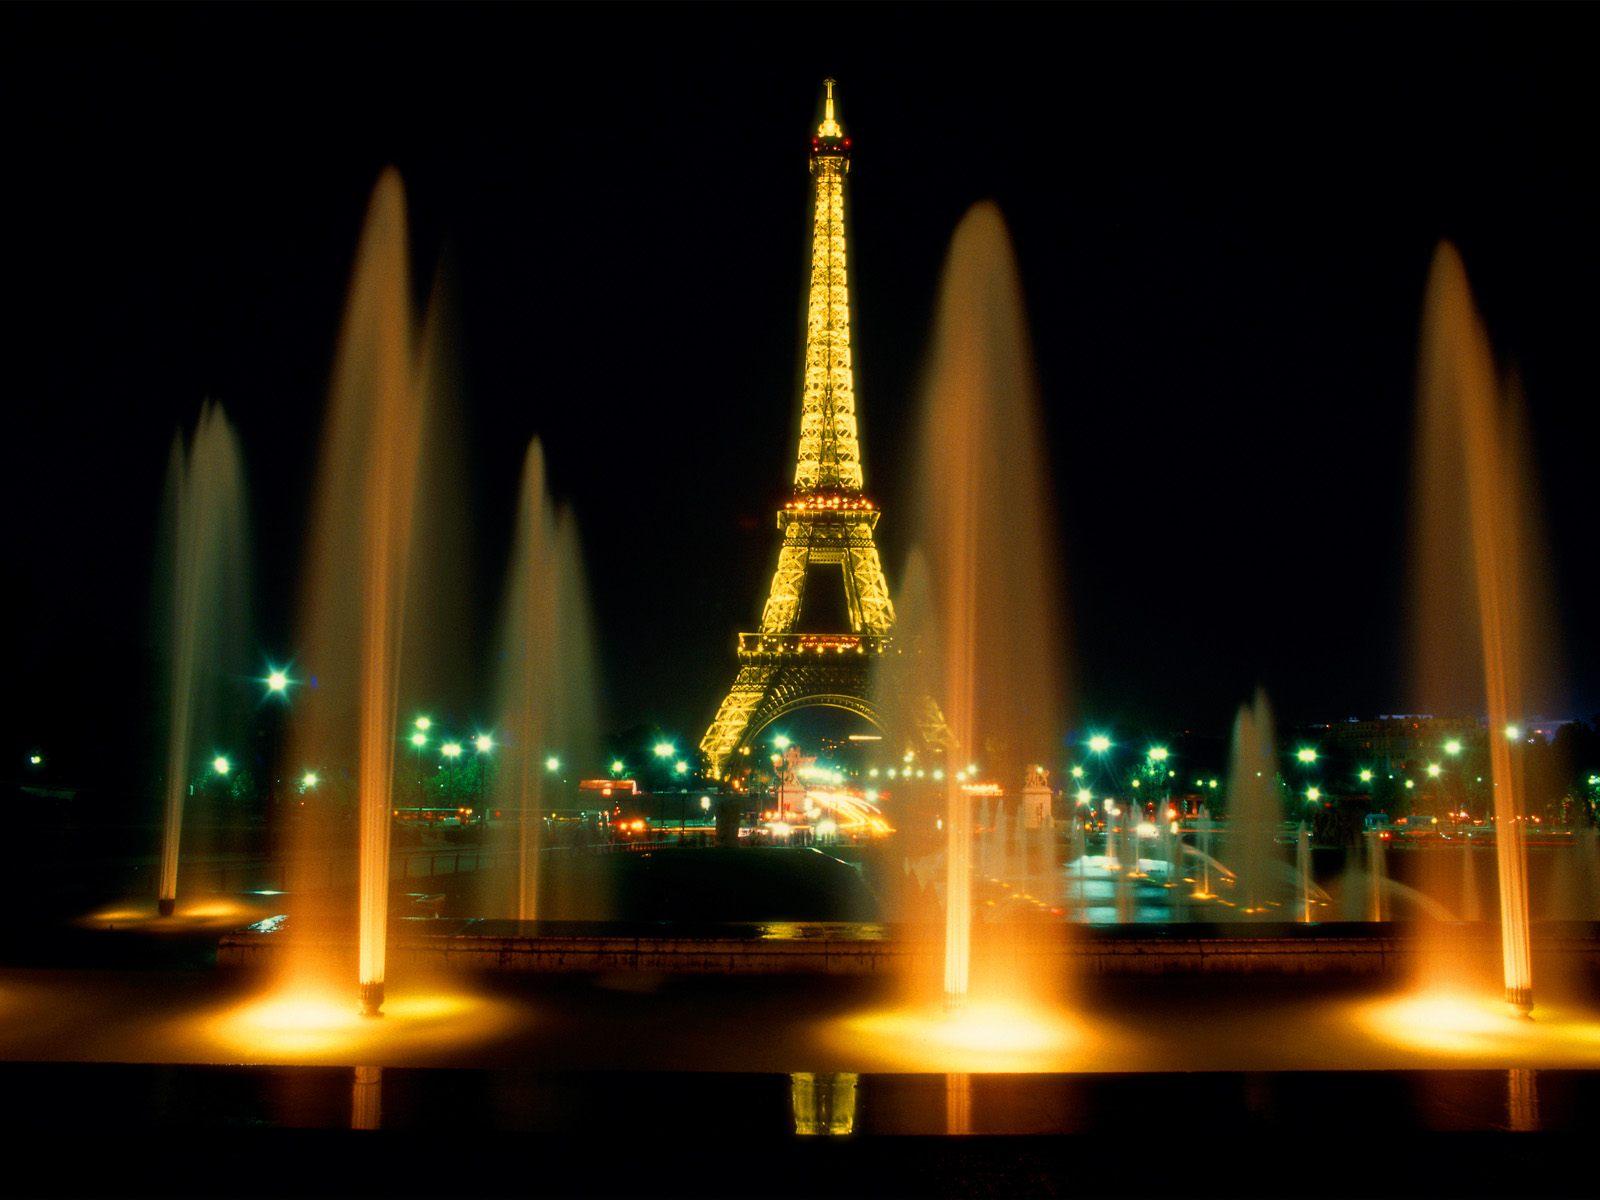 Hd Christmas Wallpapers 1080p Paris France Wallpaper Free Download Wallpaper